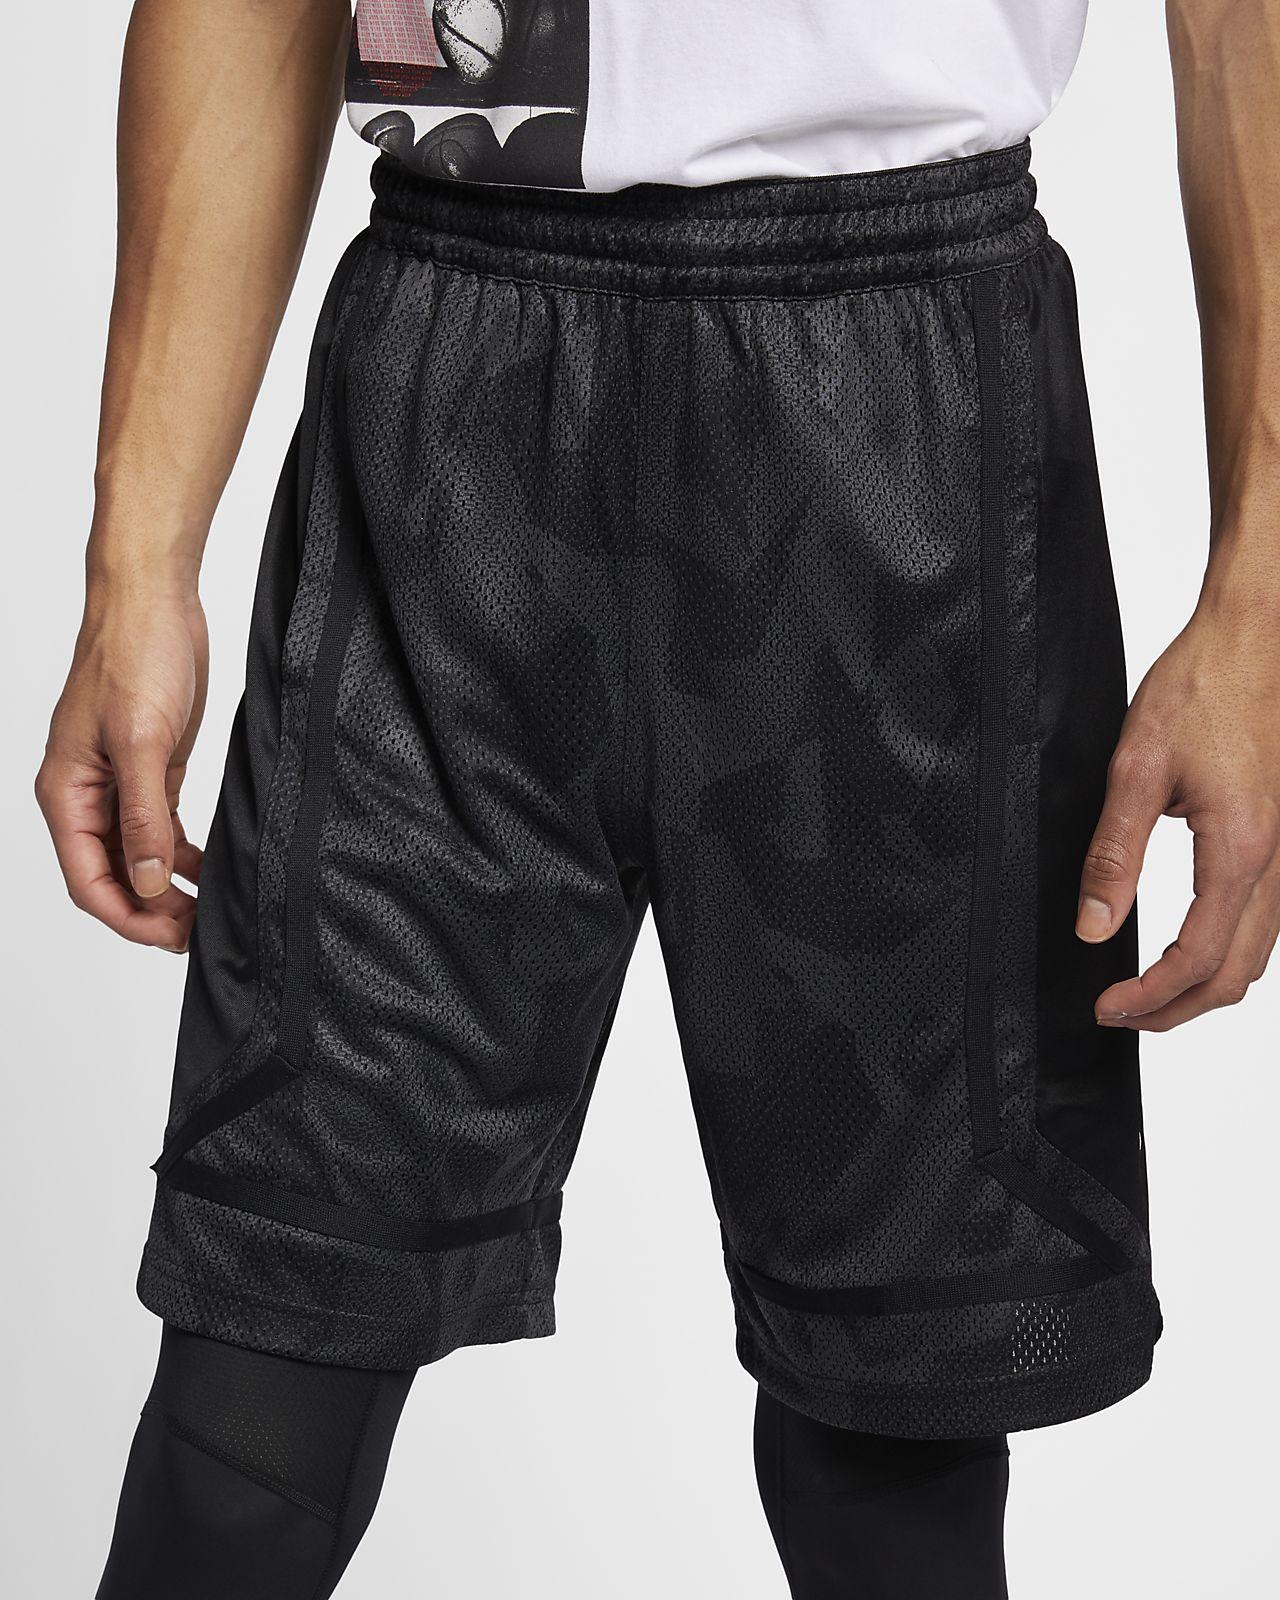 a491e08694 Kyrie Dri-FIT Elite Pantalón corto de baloncesto - Hombre. Nike.com ES